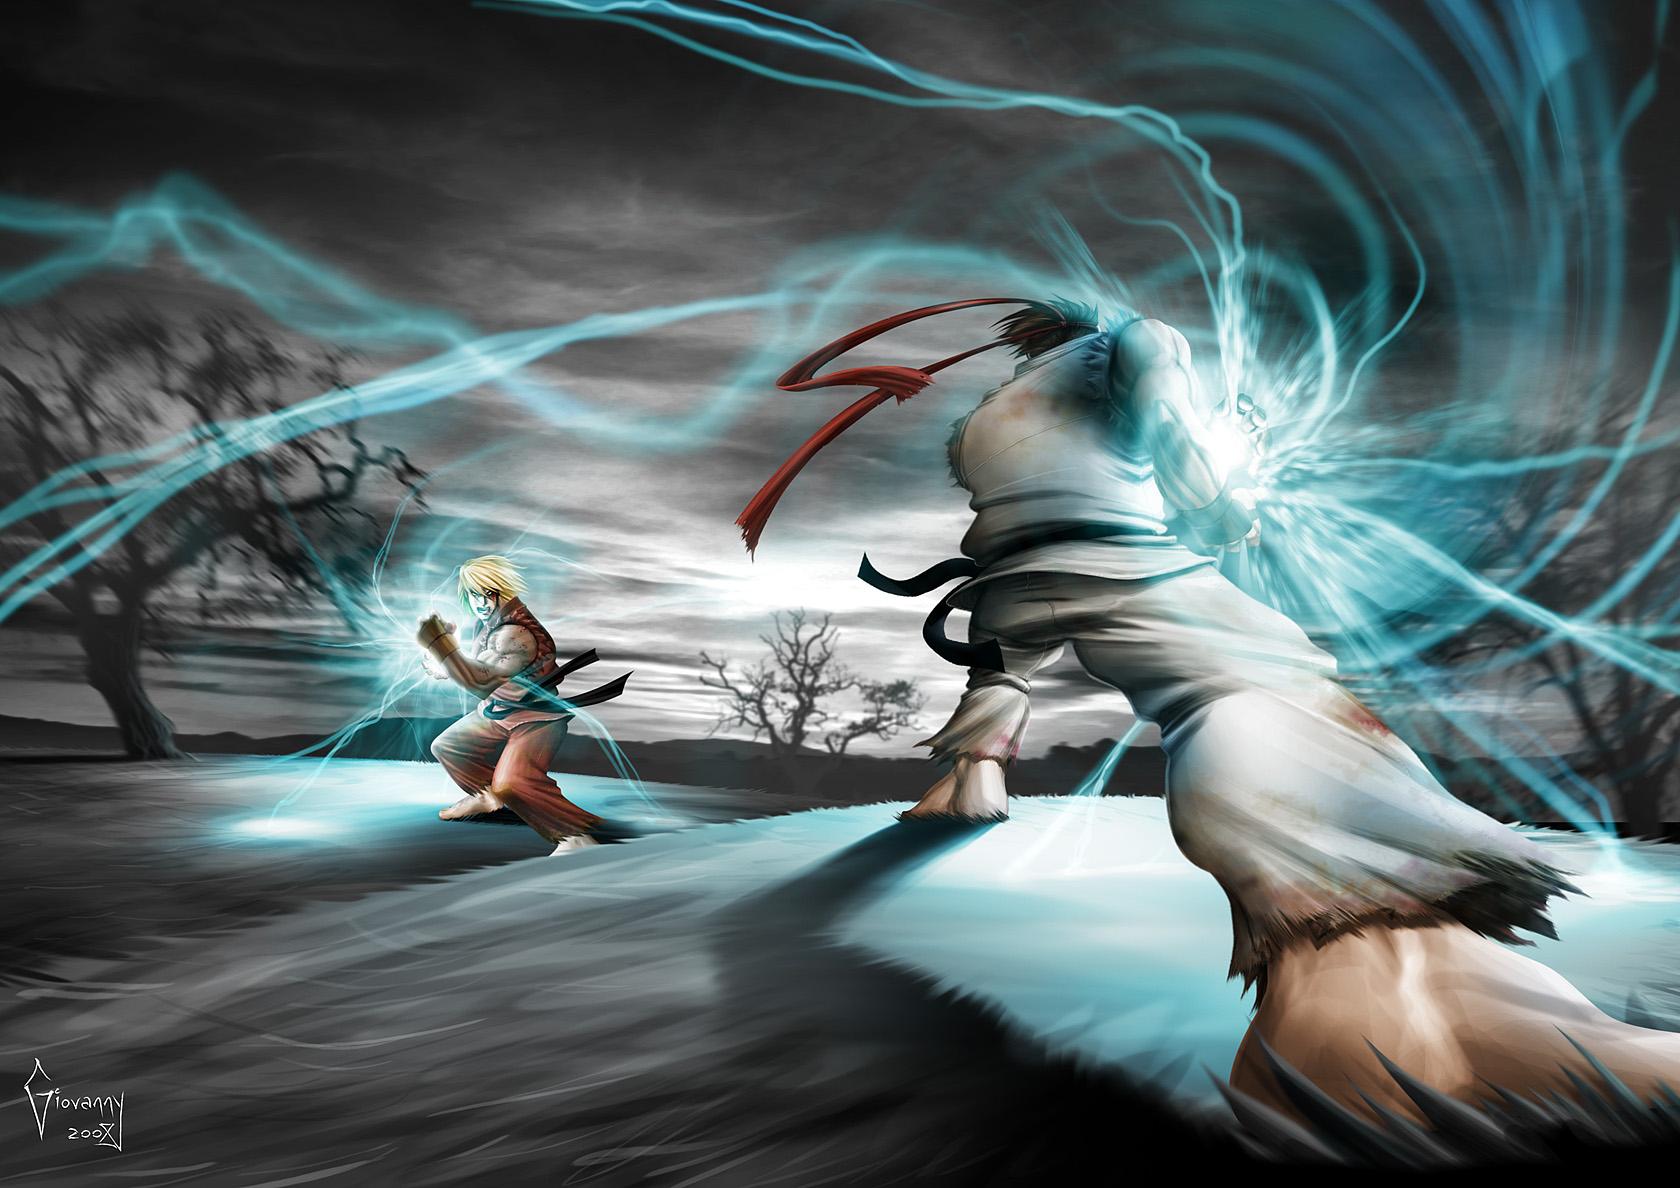 Street Fighter 4 by Matelandia